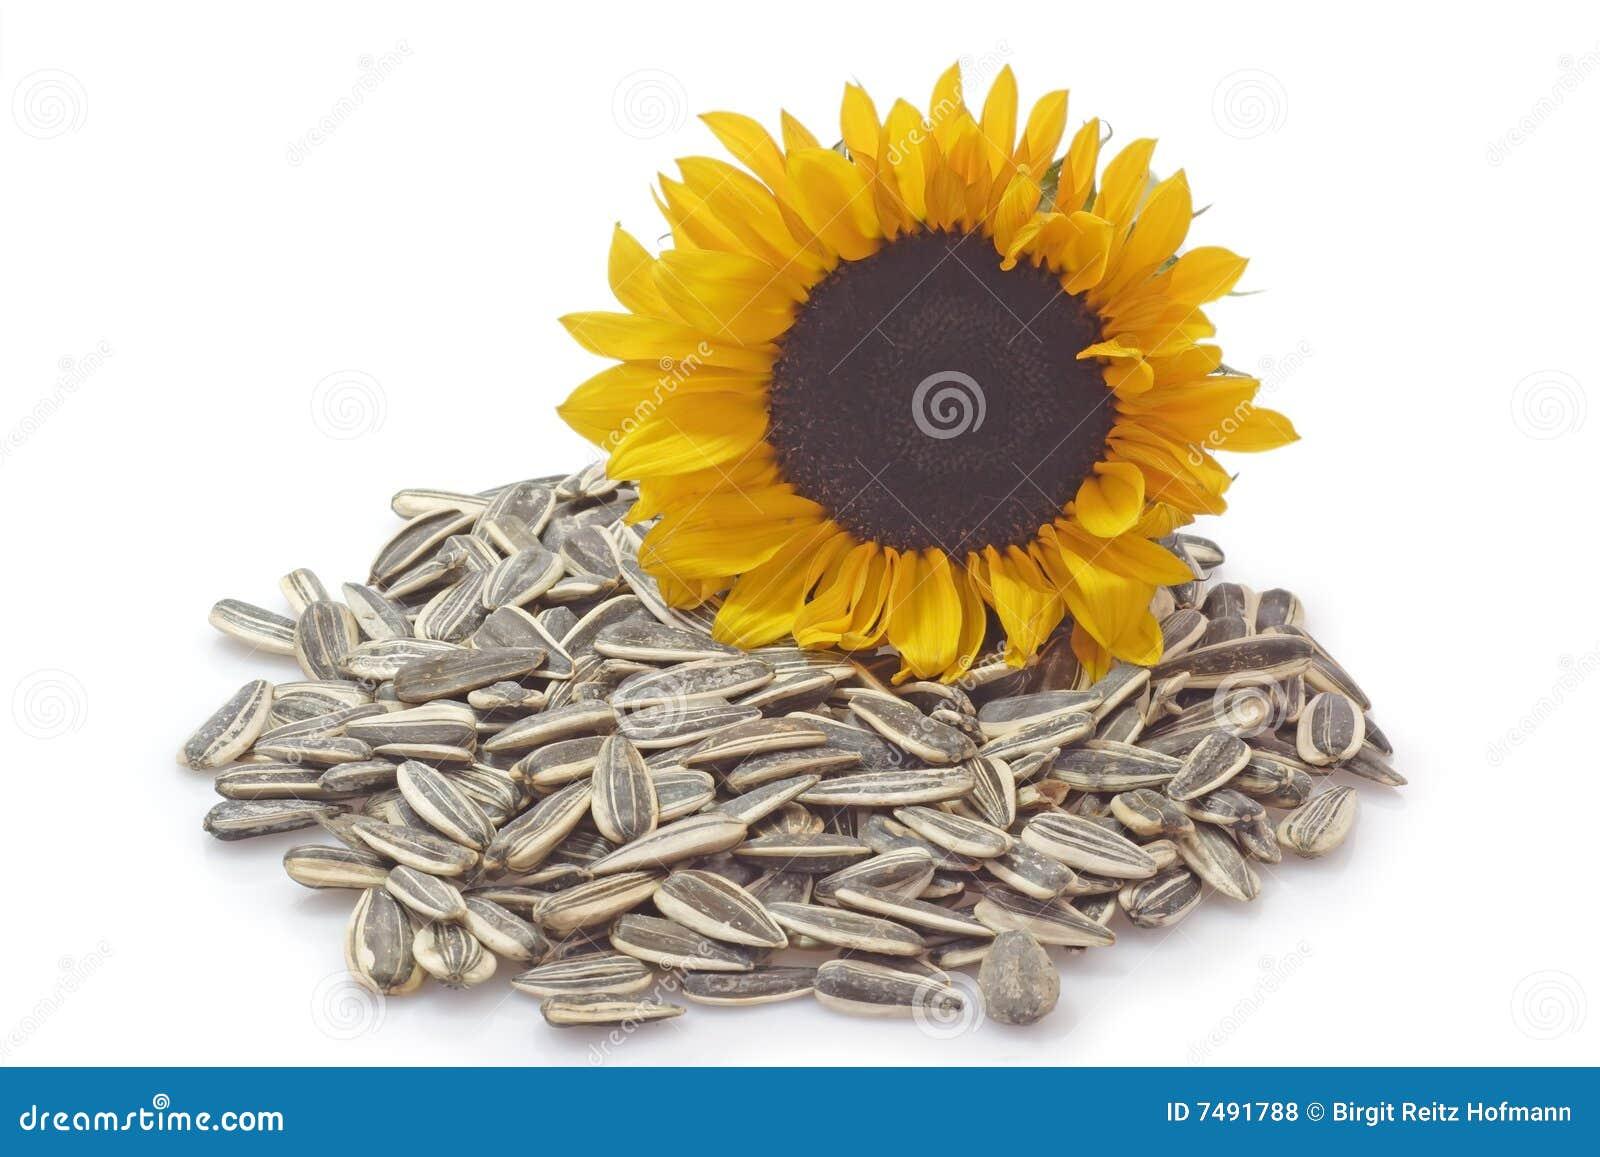 david sunflower seeds clipart - photo #10